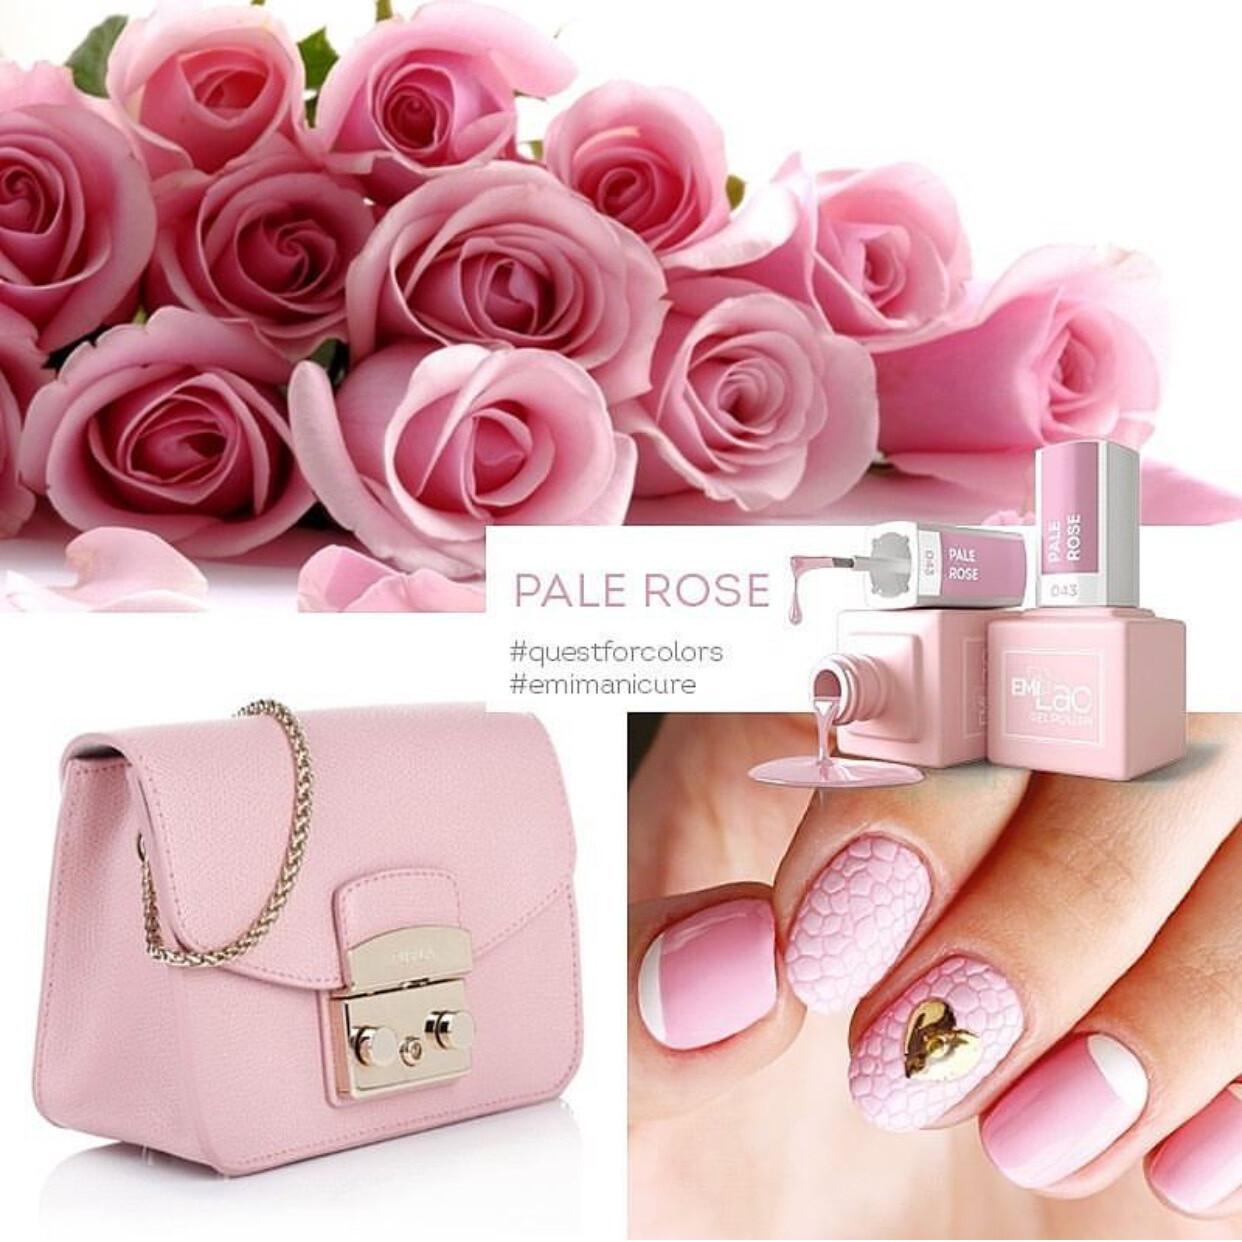 E.MiLac SE Pale Rose #043, 9 ml.